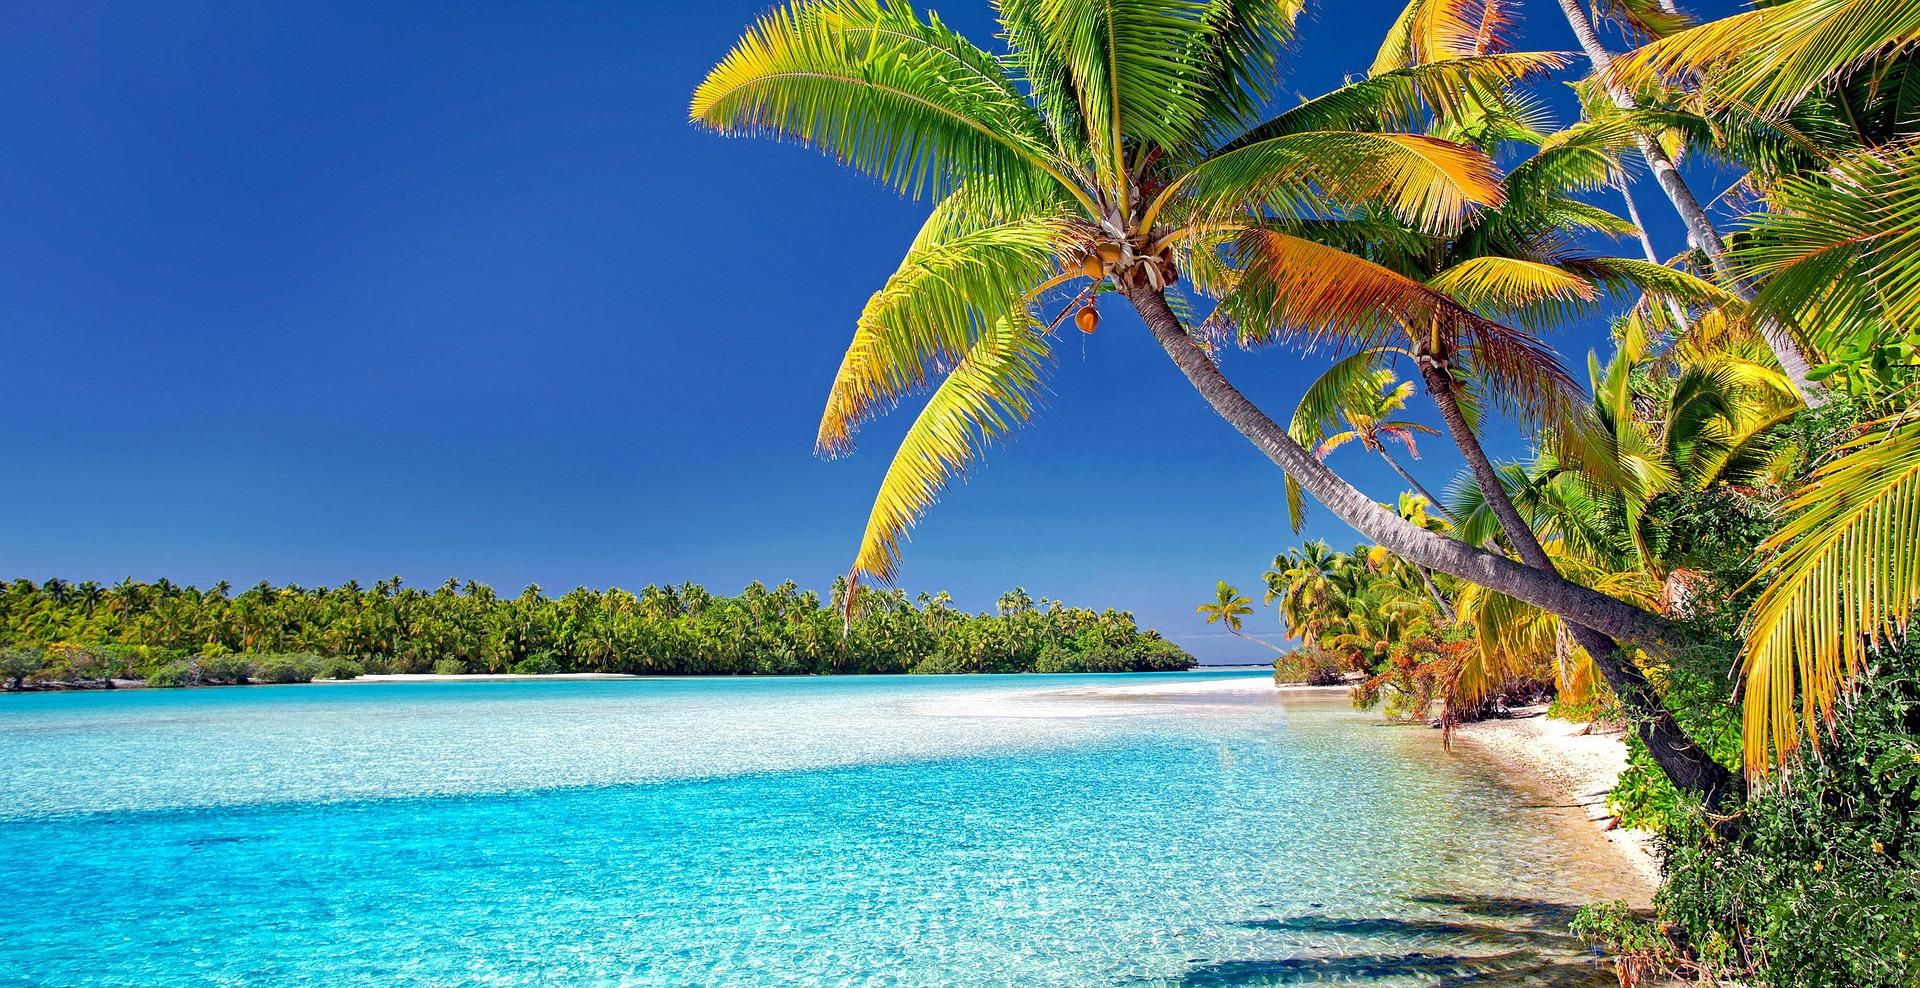 Aitutaki_iles_Cook.jpg?1564993069